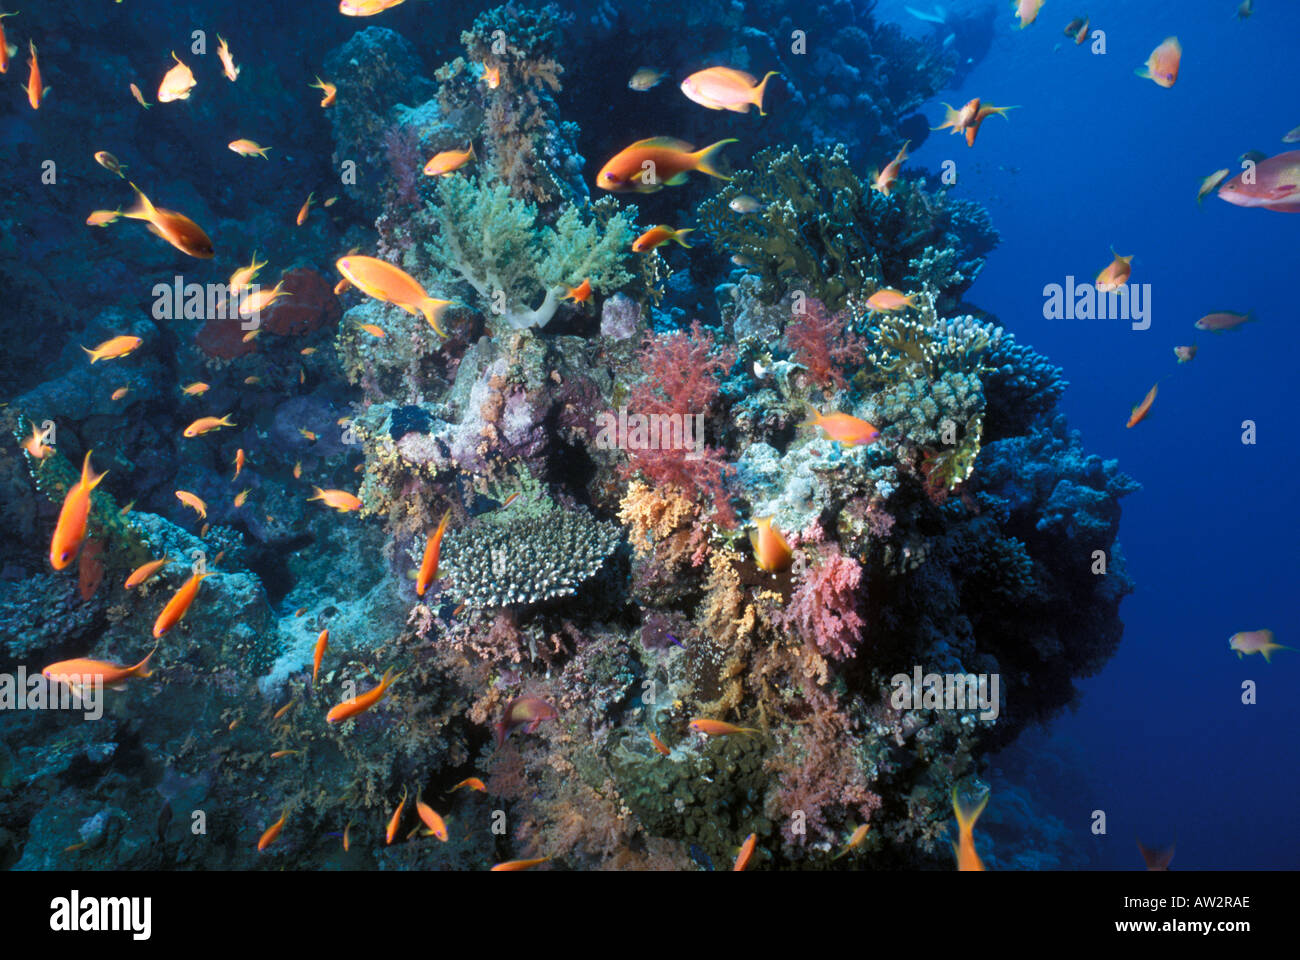 Egypt underwater Red Sea coral reef with schooling orange reef ...